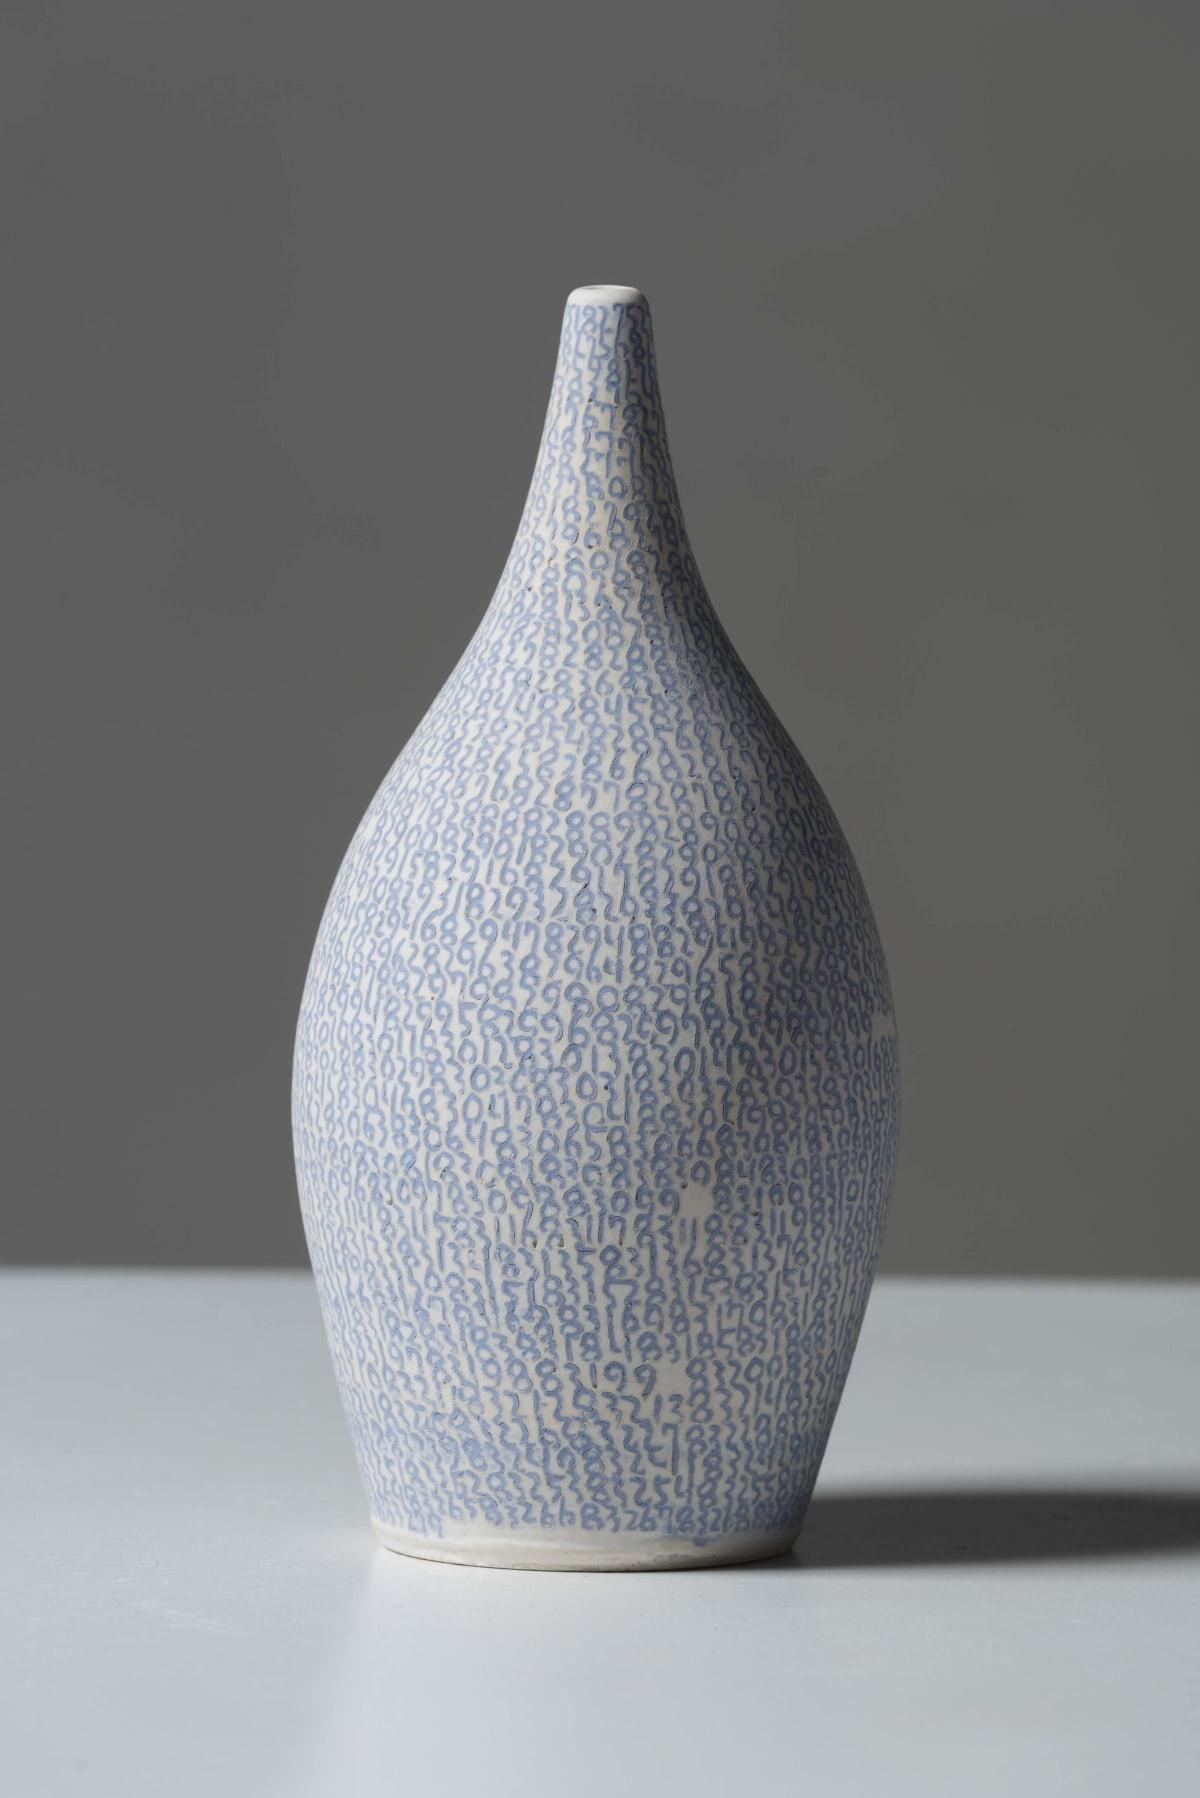 Toshio Matsui, Vase